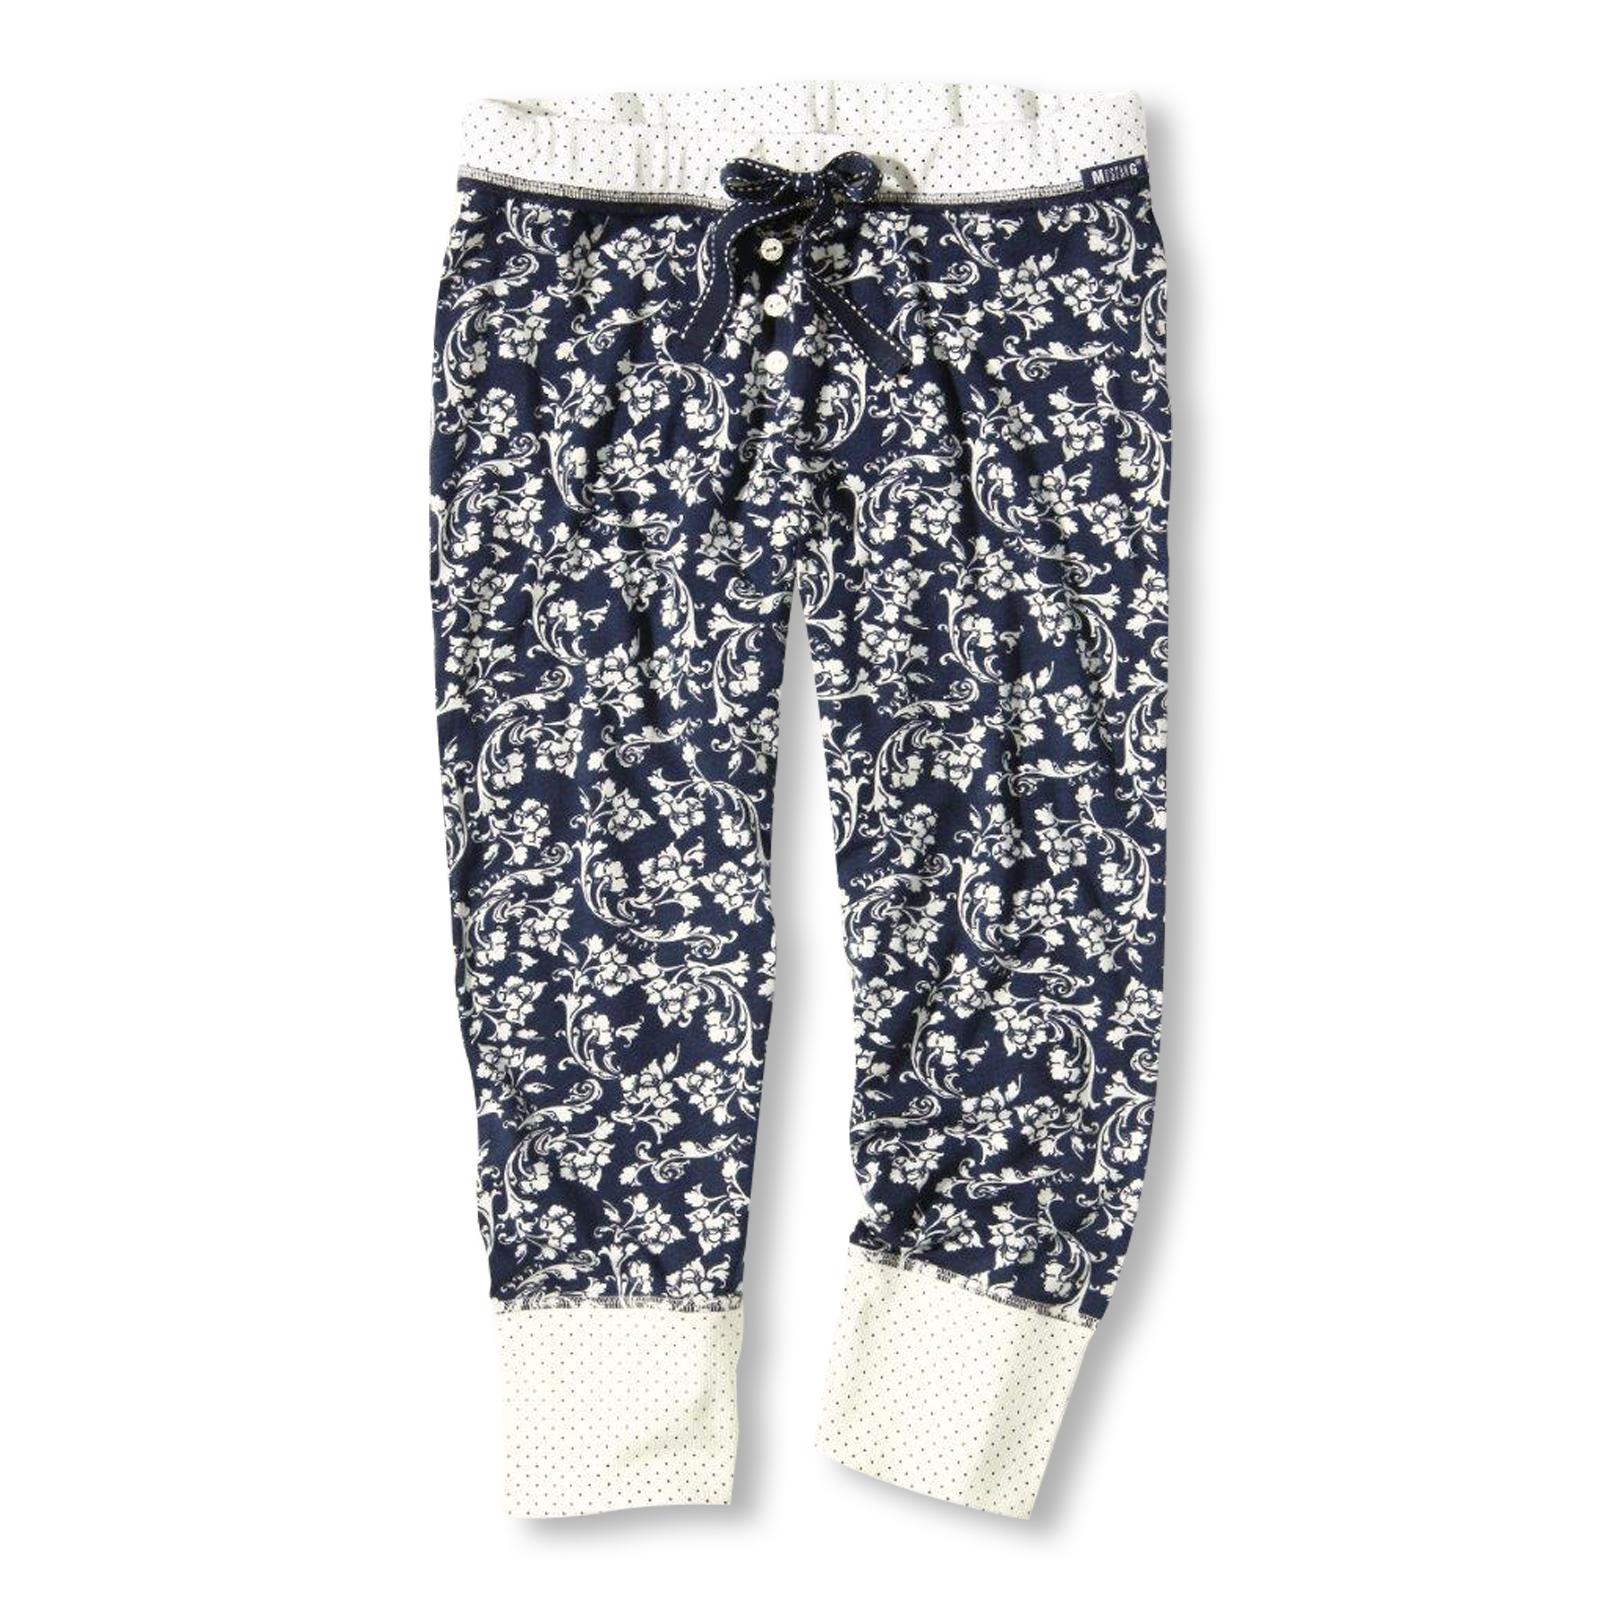 MUSTANG Damen Pyjamahose kurz Schlafanzughose Shorts Shorty Sharon S M L XL